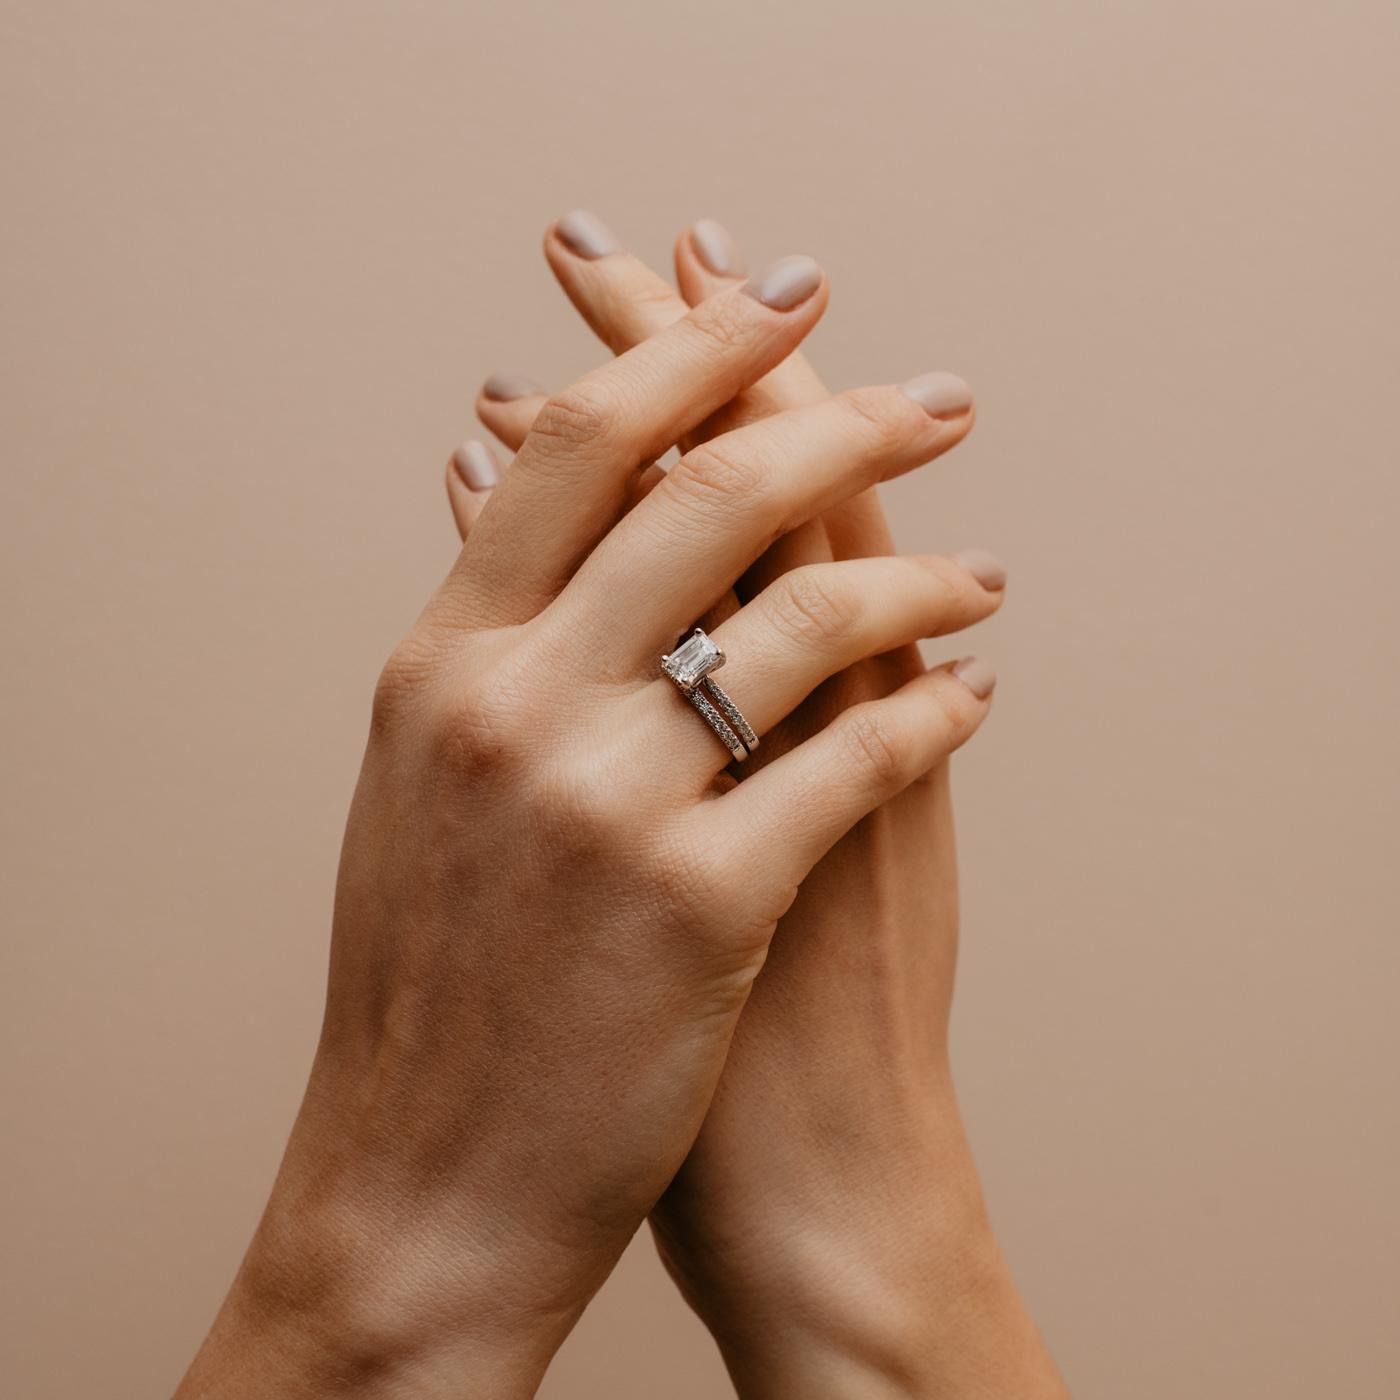 Conflict Free Diamond Wedding Ring   Nouveau   Ethica Diamonds UK